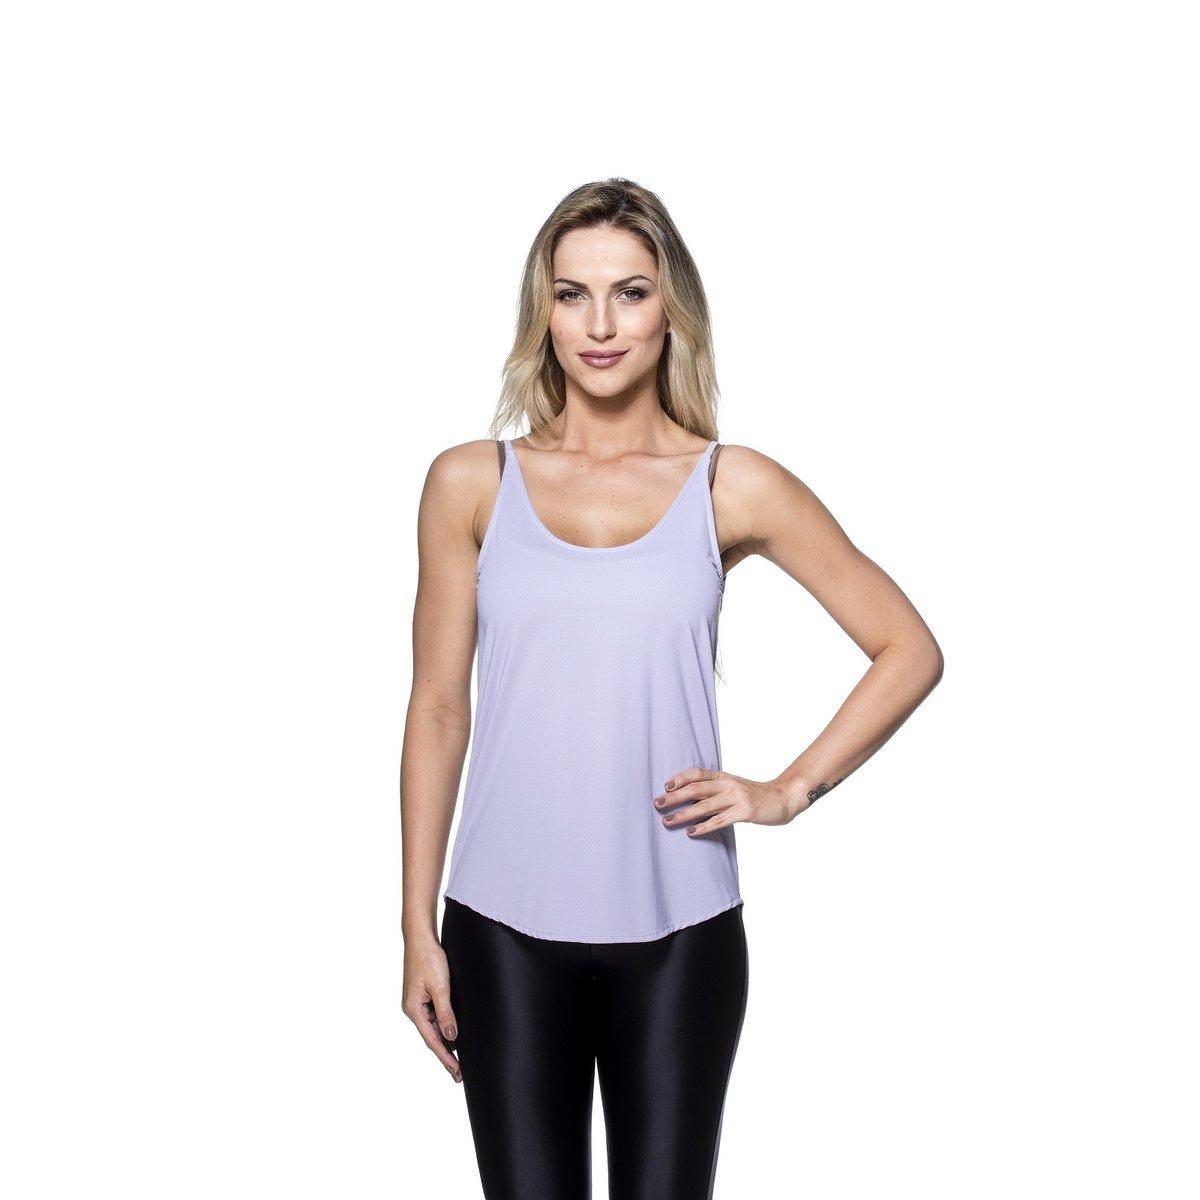 db2af13fae Camiseta Regata Fitness Mulher Elástica Lara Dry Fit